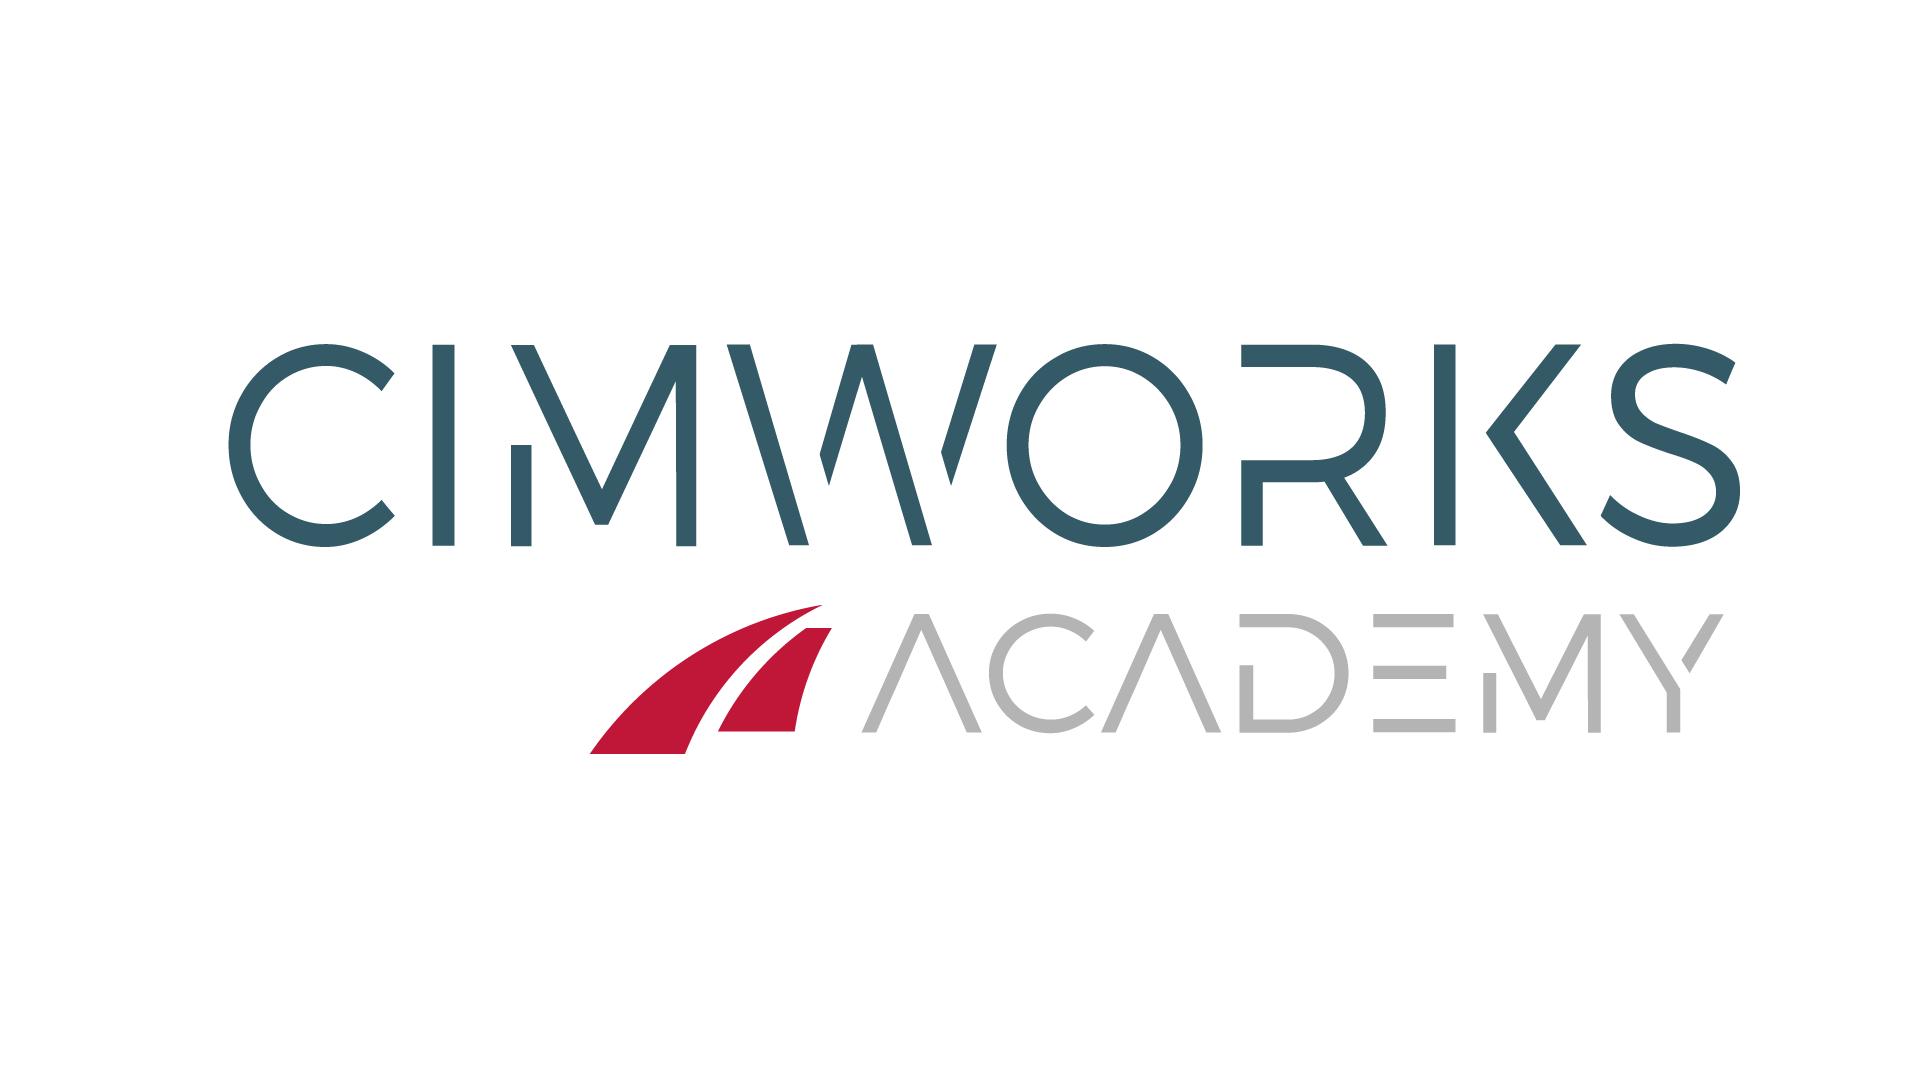 CIMWORKS Academy